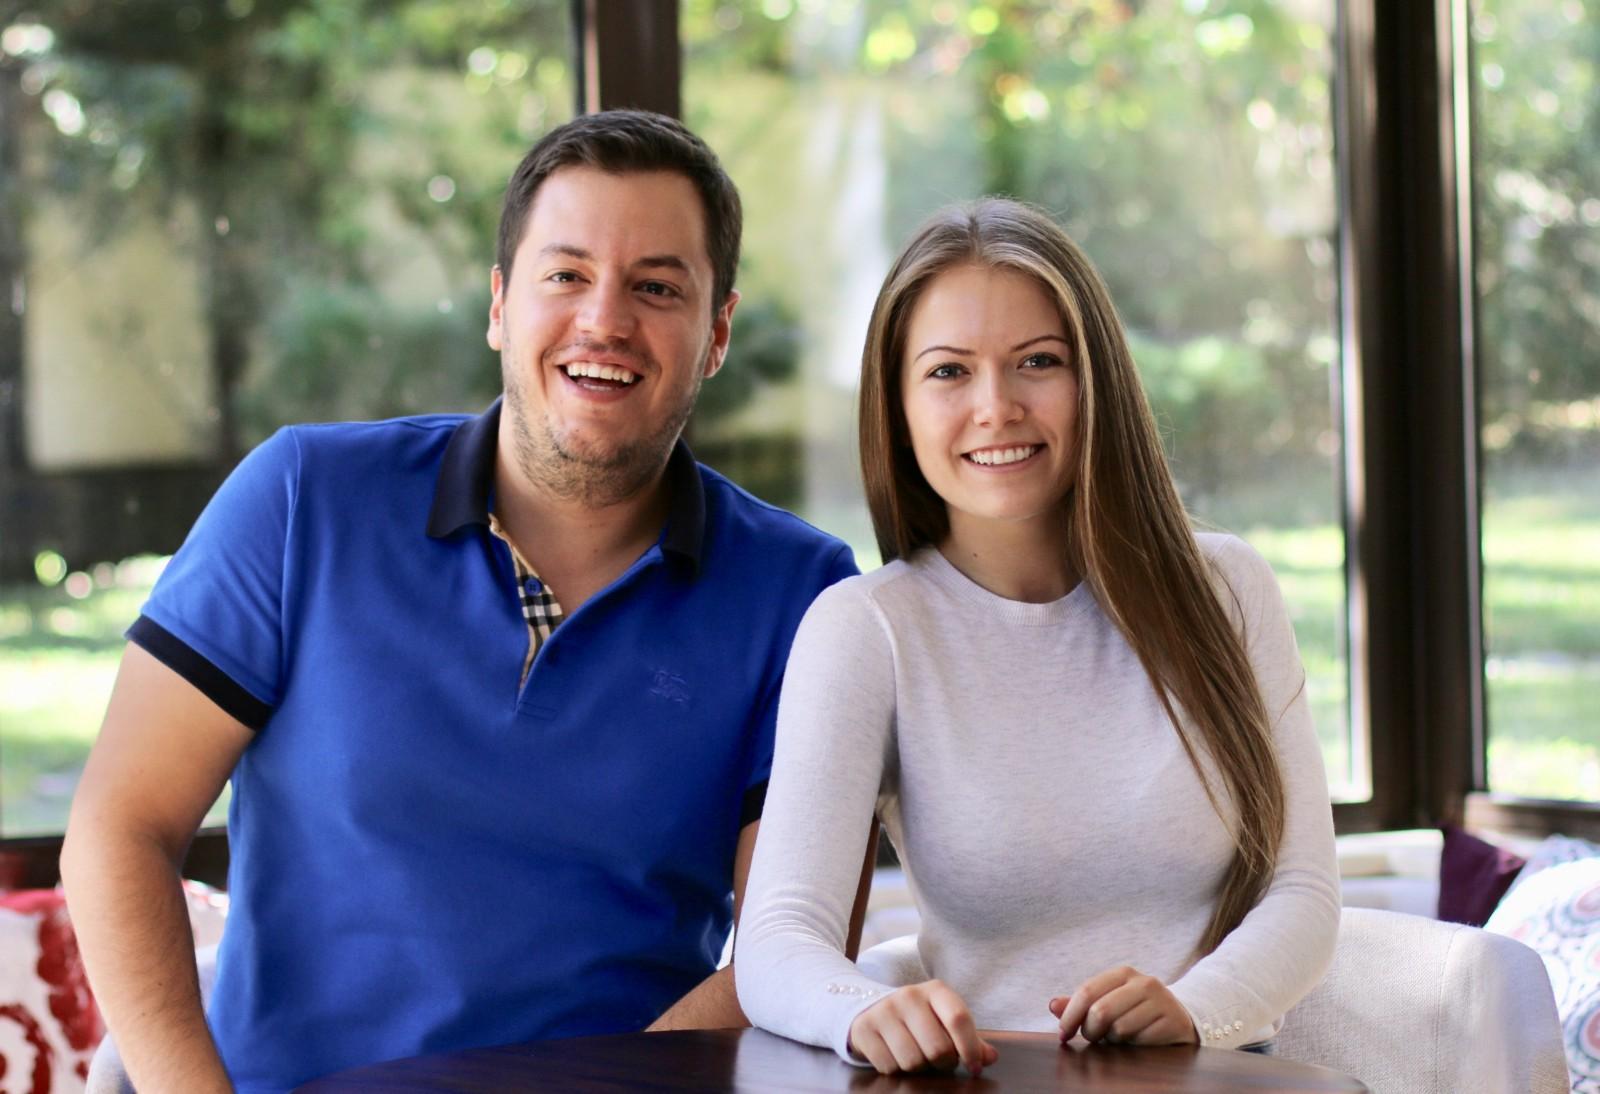 /founders-interviews-dimitar-vidolov-of-sensei-school-286917901040 feature image